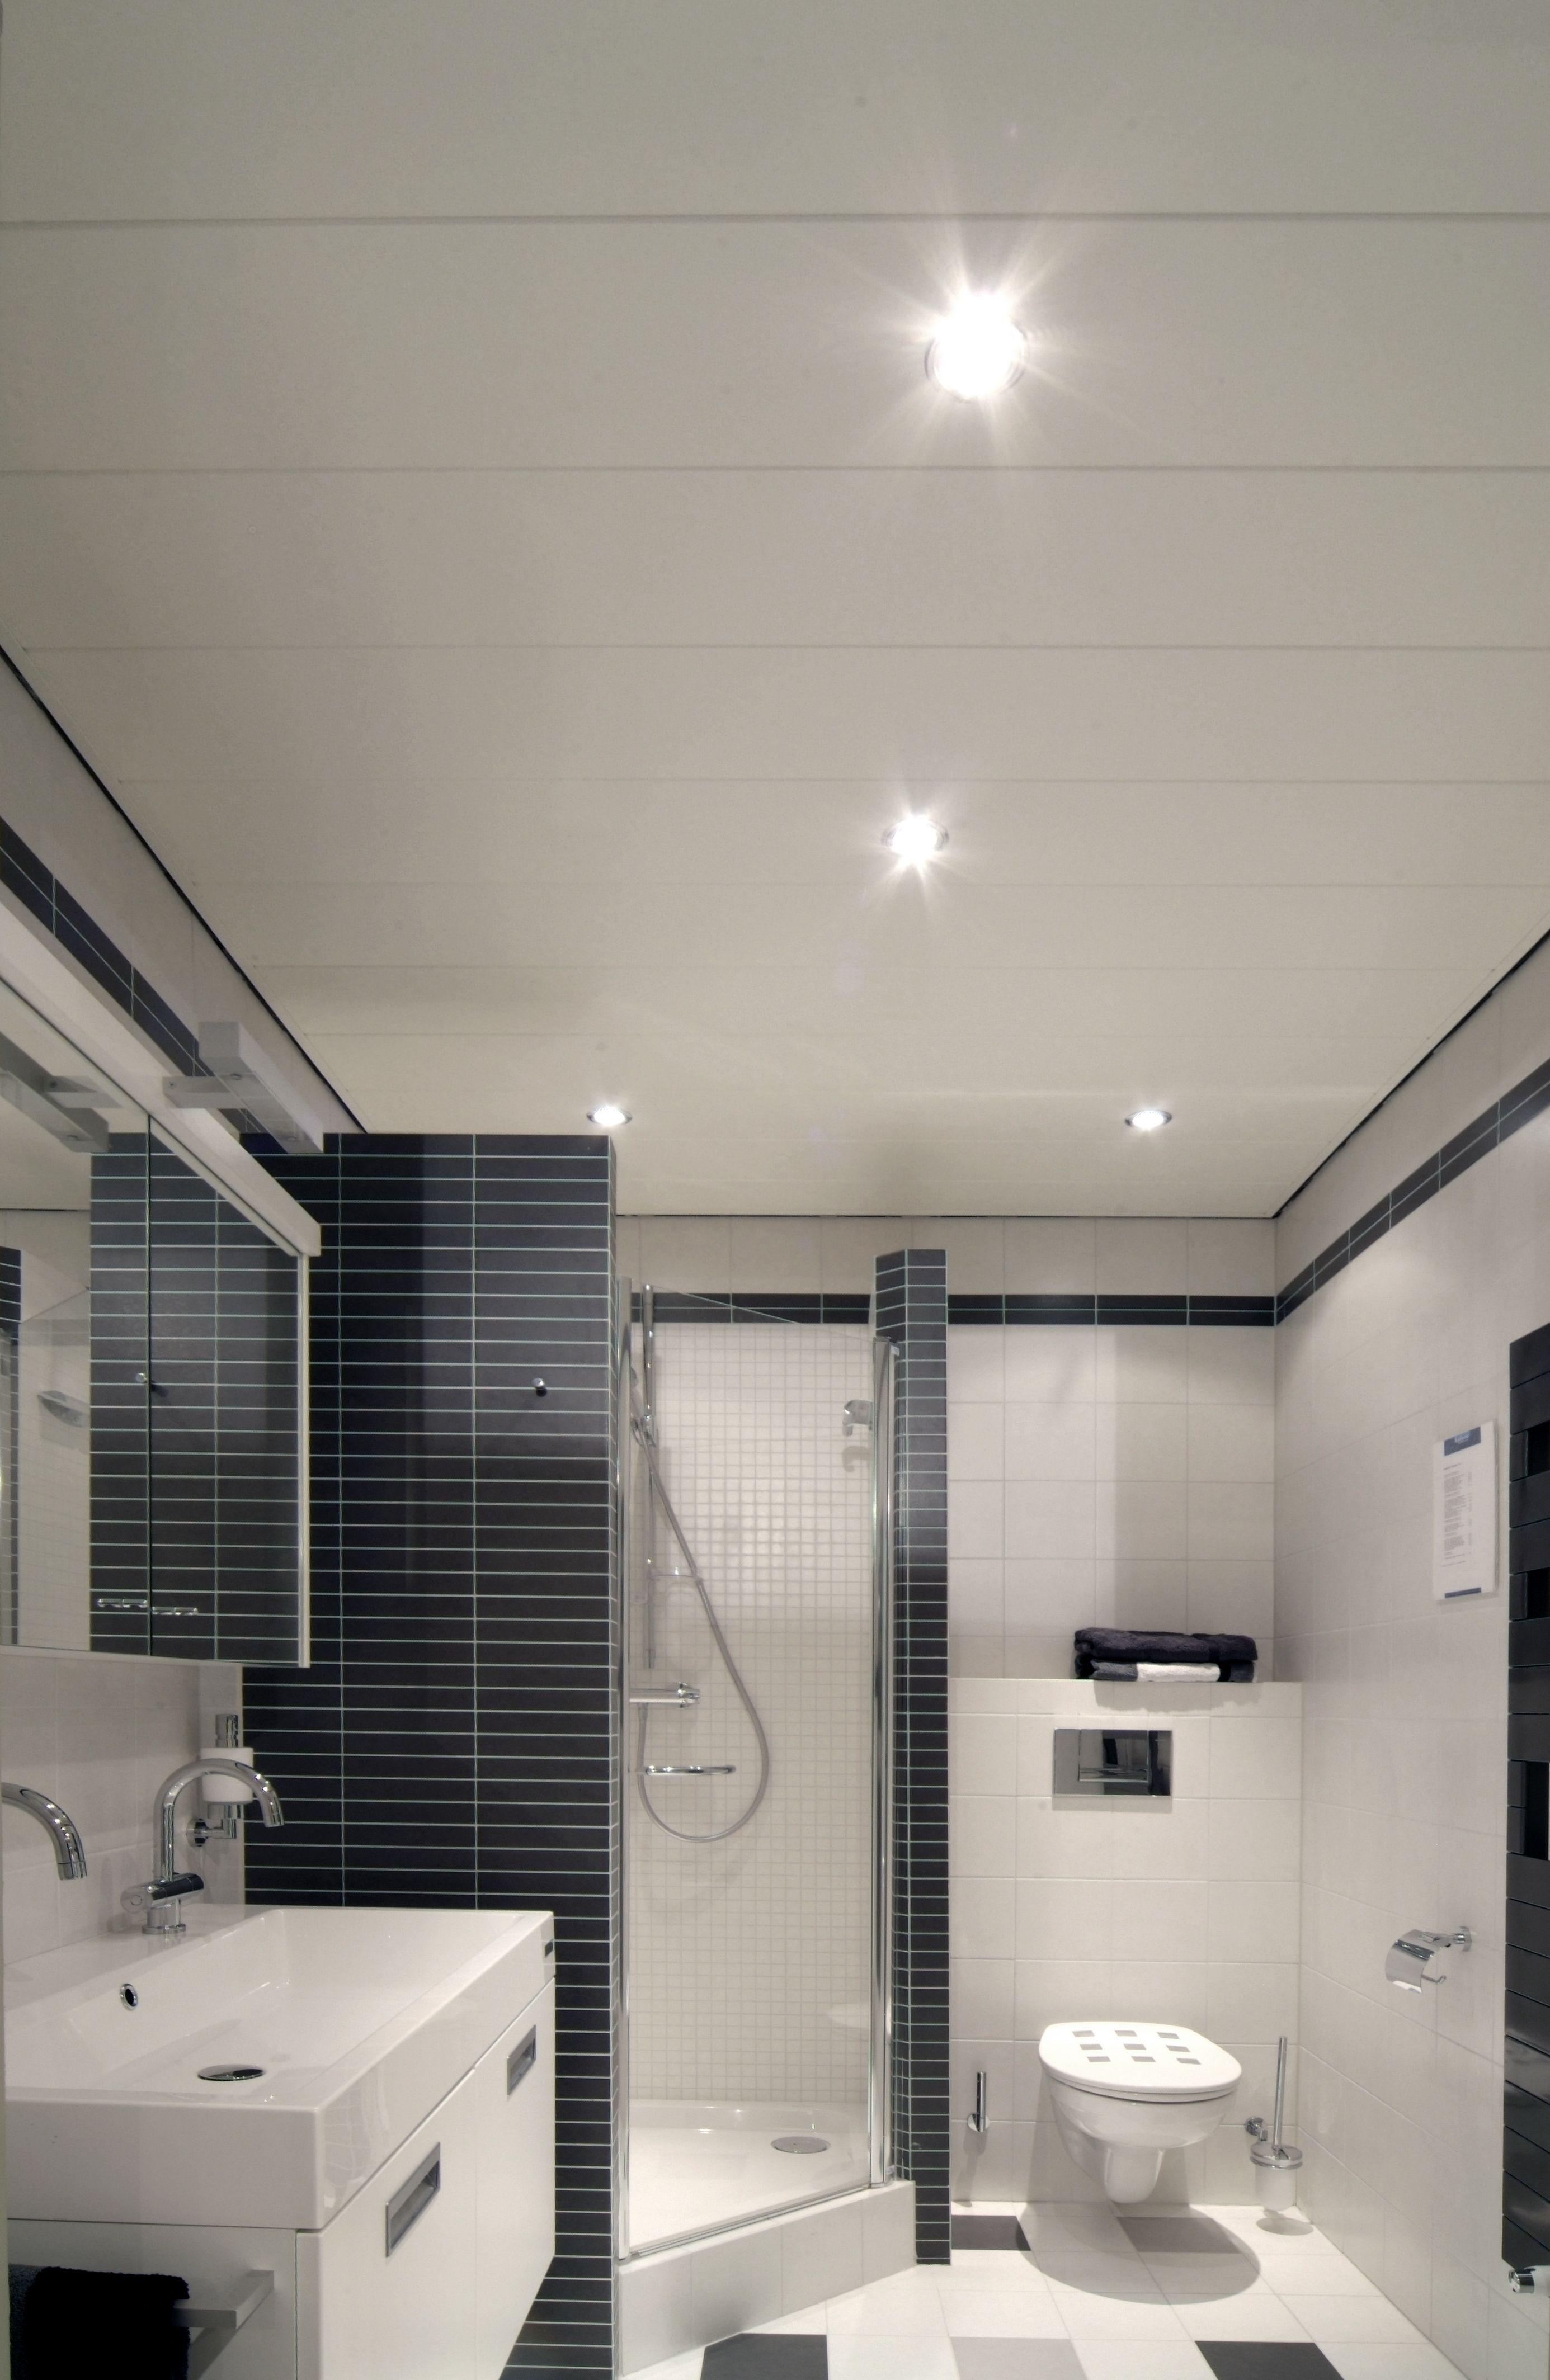 luxalon plafond i badkamer i aluminium plafond plafonds. Black Bedroom Furniture Sets. Home Design Ideas